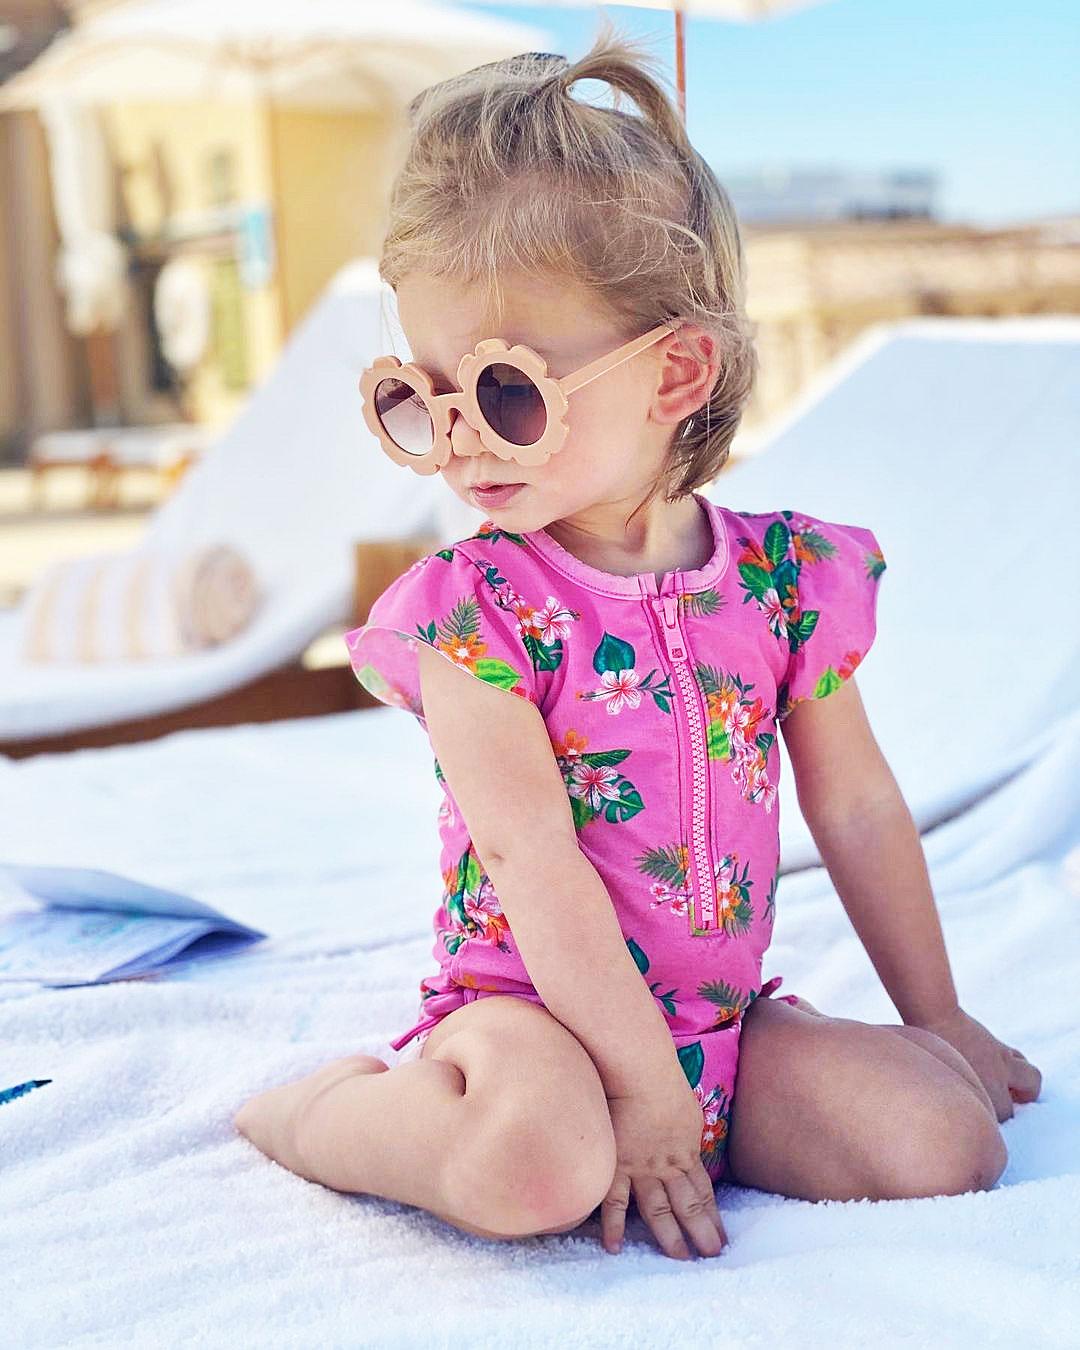 Arie Luyendyk Jr., Lauren Burnham's Daughter Is a 'Mood' Playing Poolside